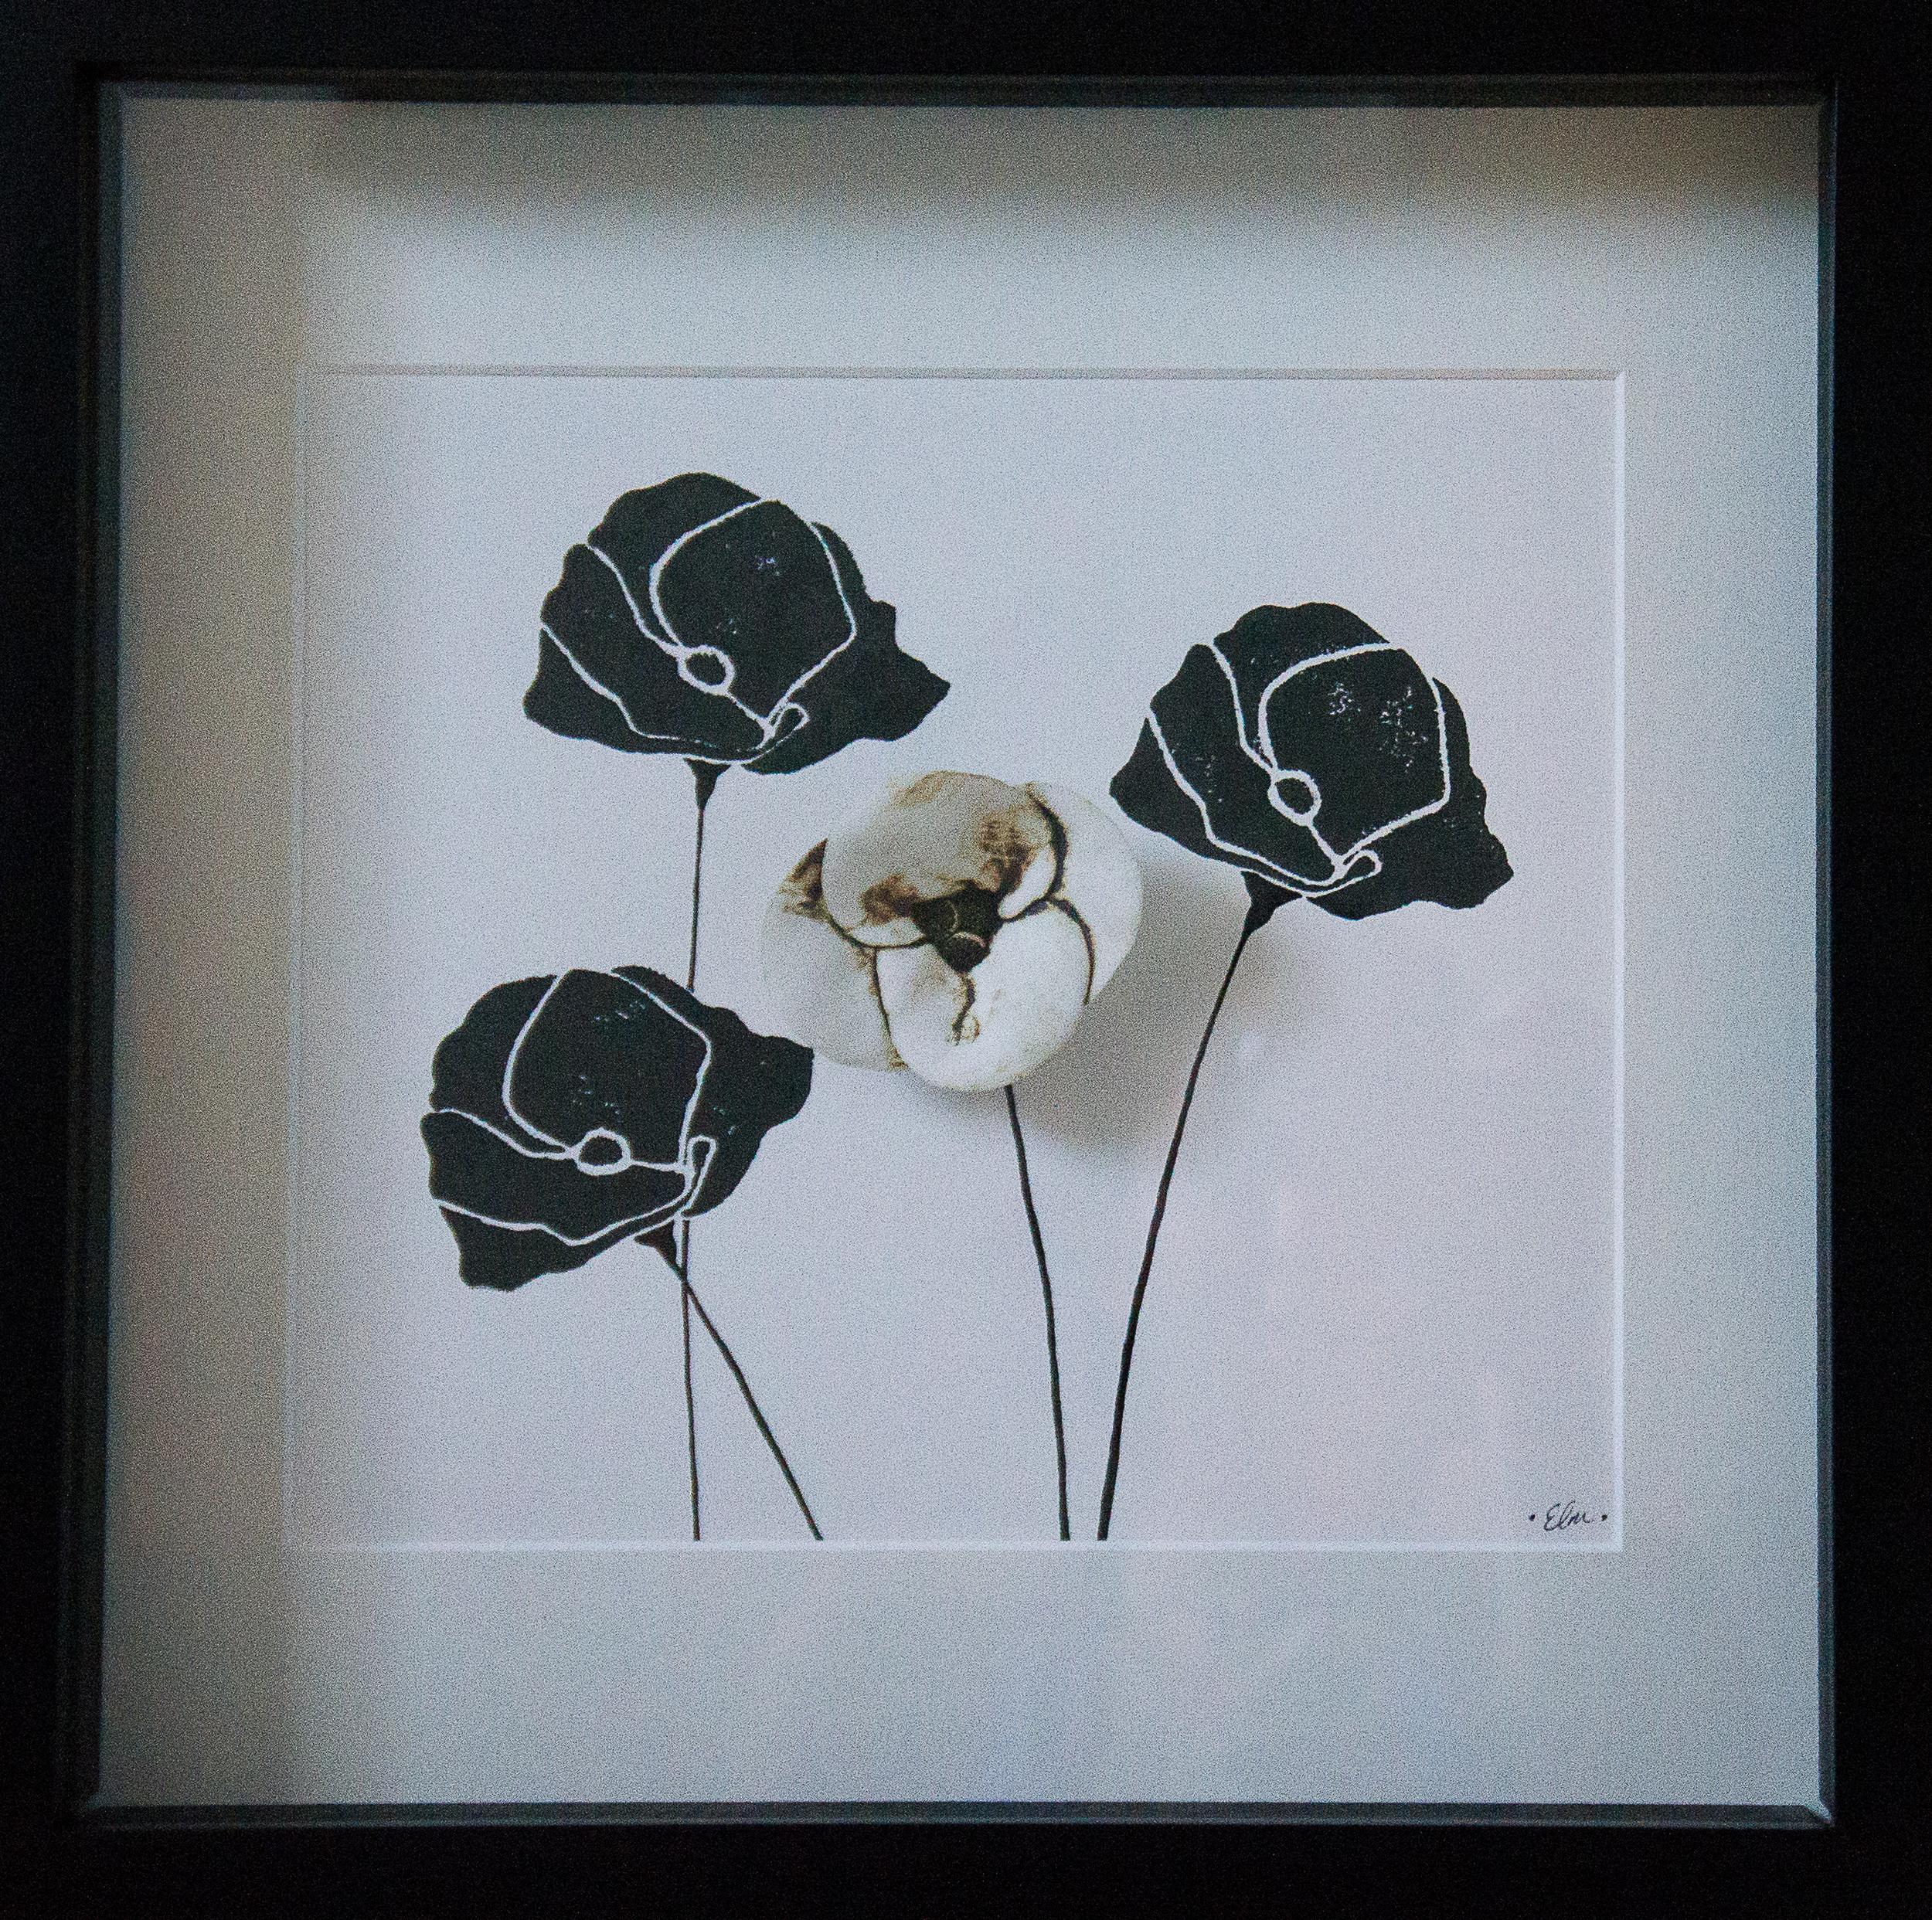 Poppies in Black & White #3